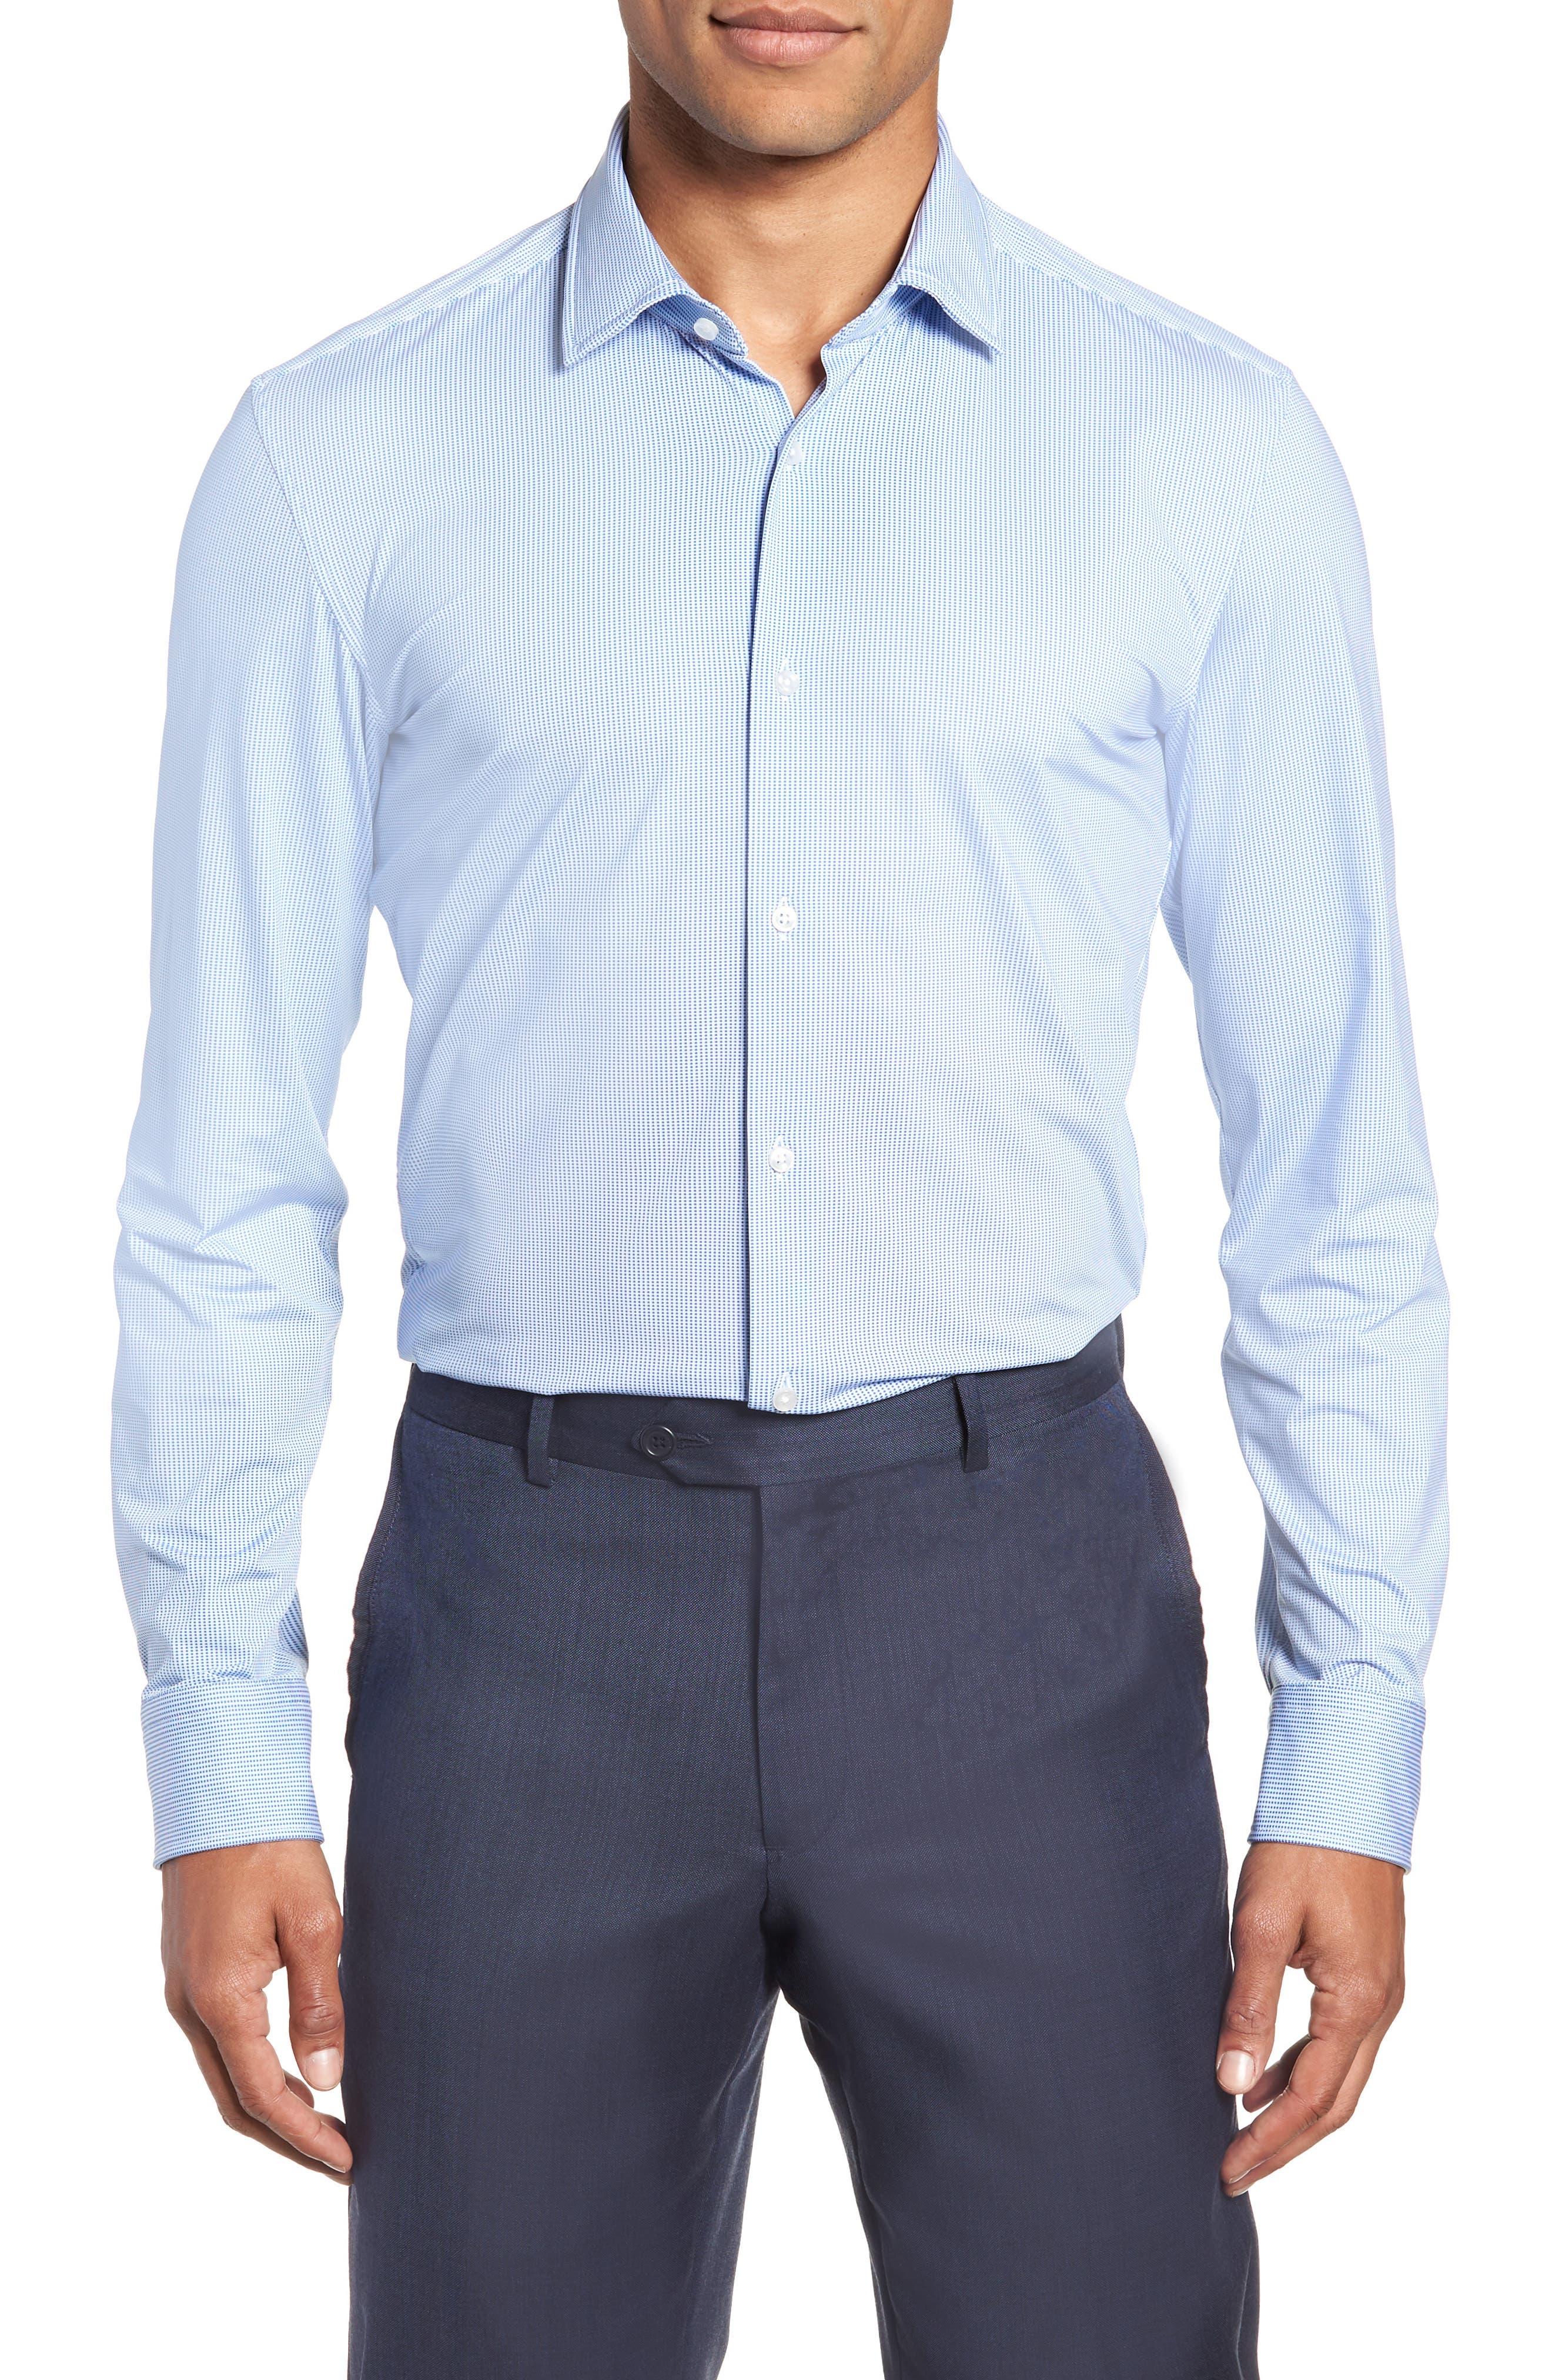 Jenno Slim Fit Stretch Check Dress Shirt,                         Main,                         color, BLUE